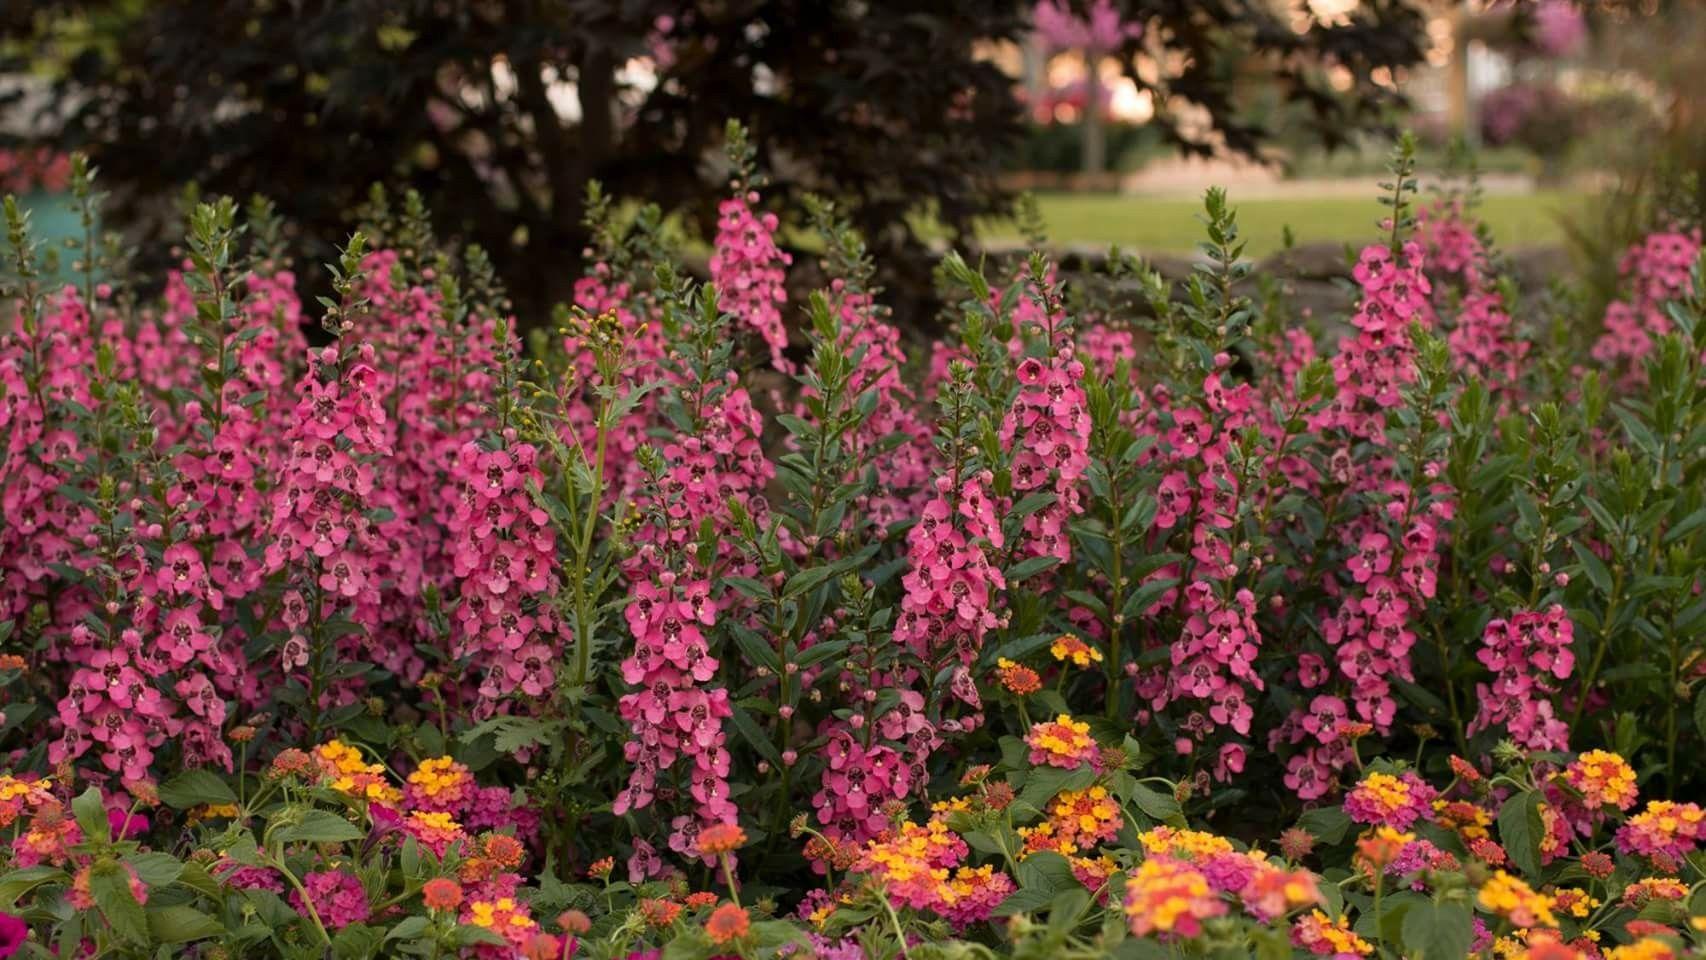 Pin by Brook Albright on GARDEN | Pinterest | Gardens